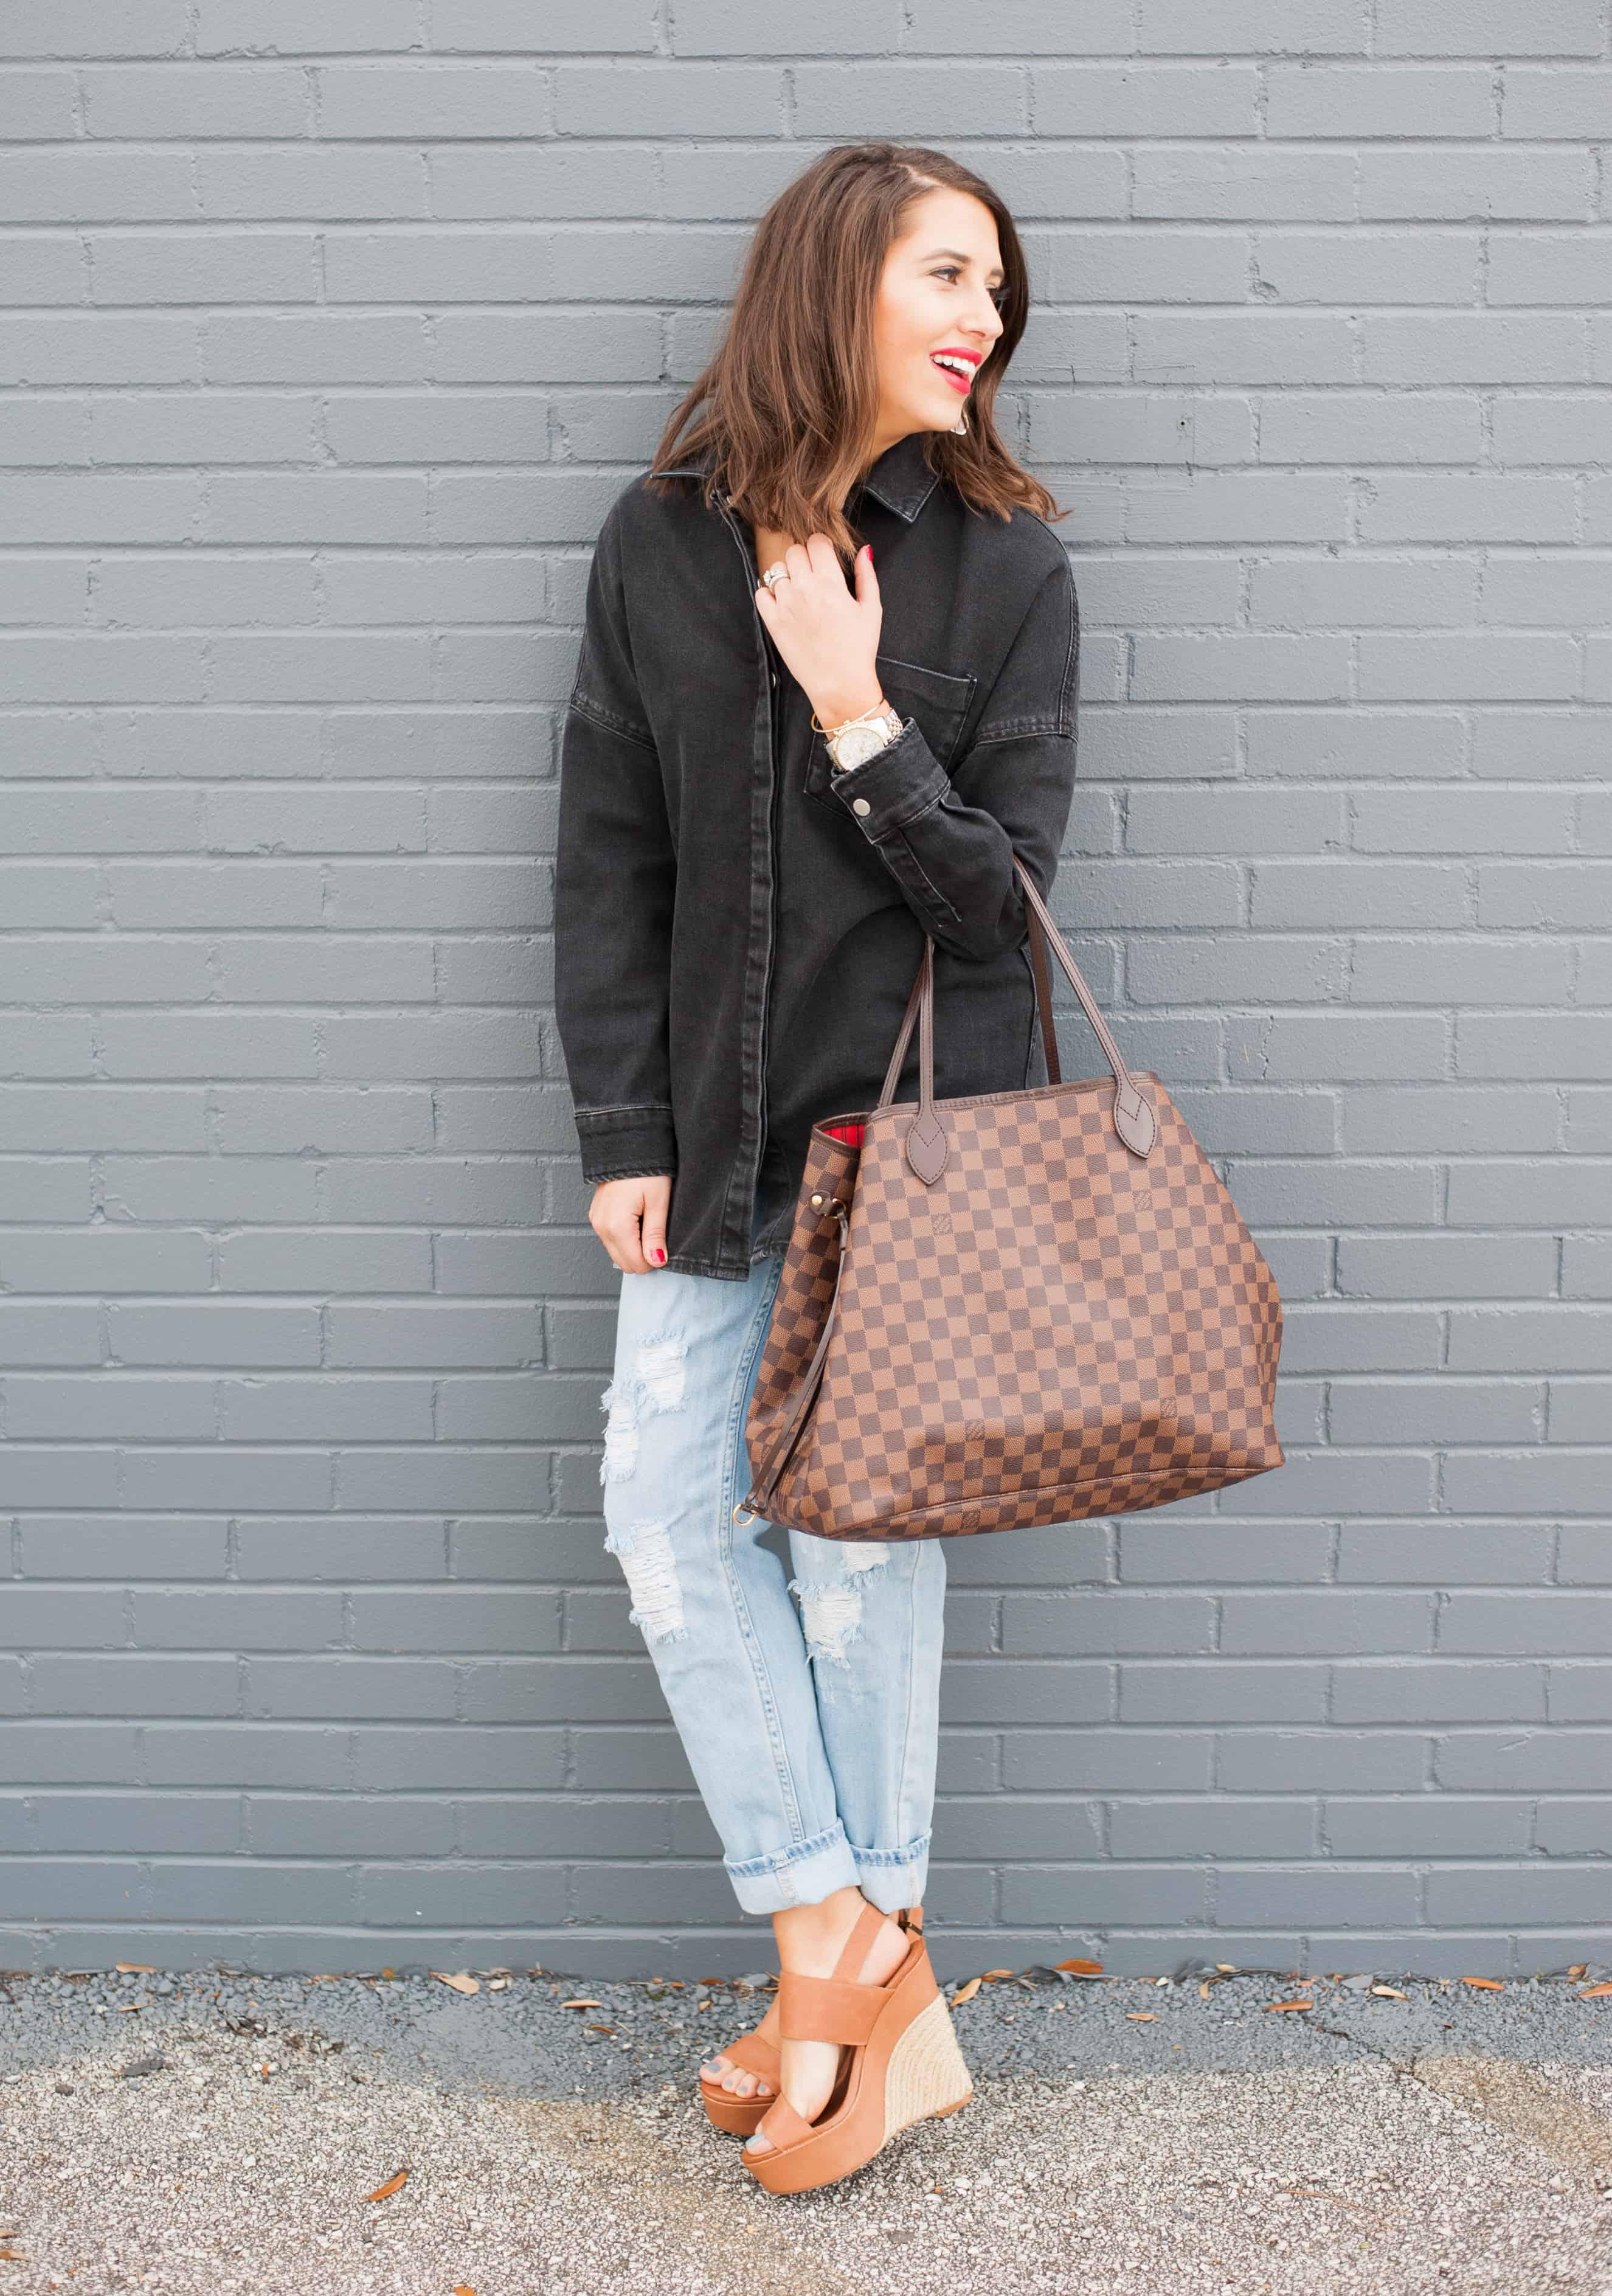 Dress Up Buttercup | Houston Fashion Blog - Dede Raad | Washed Denim